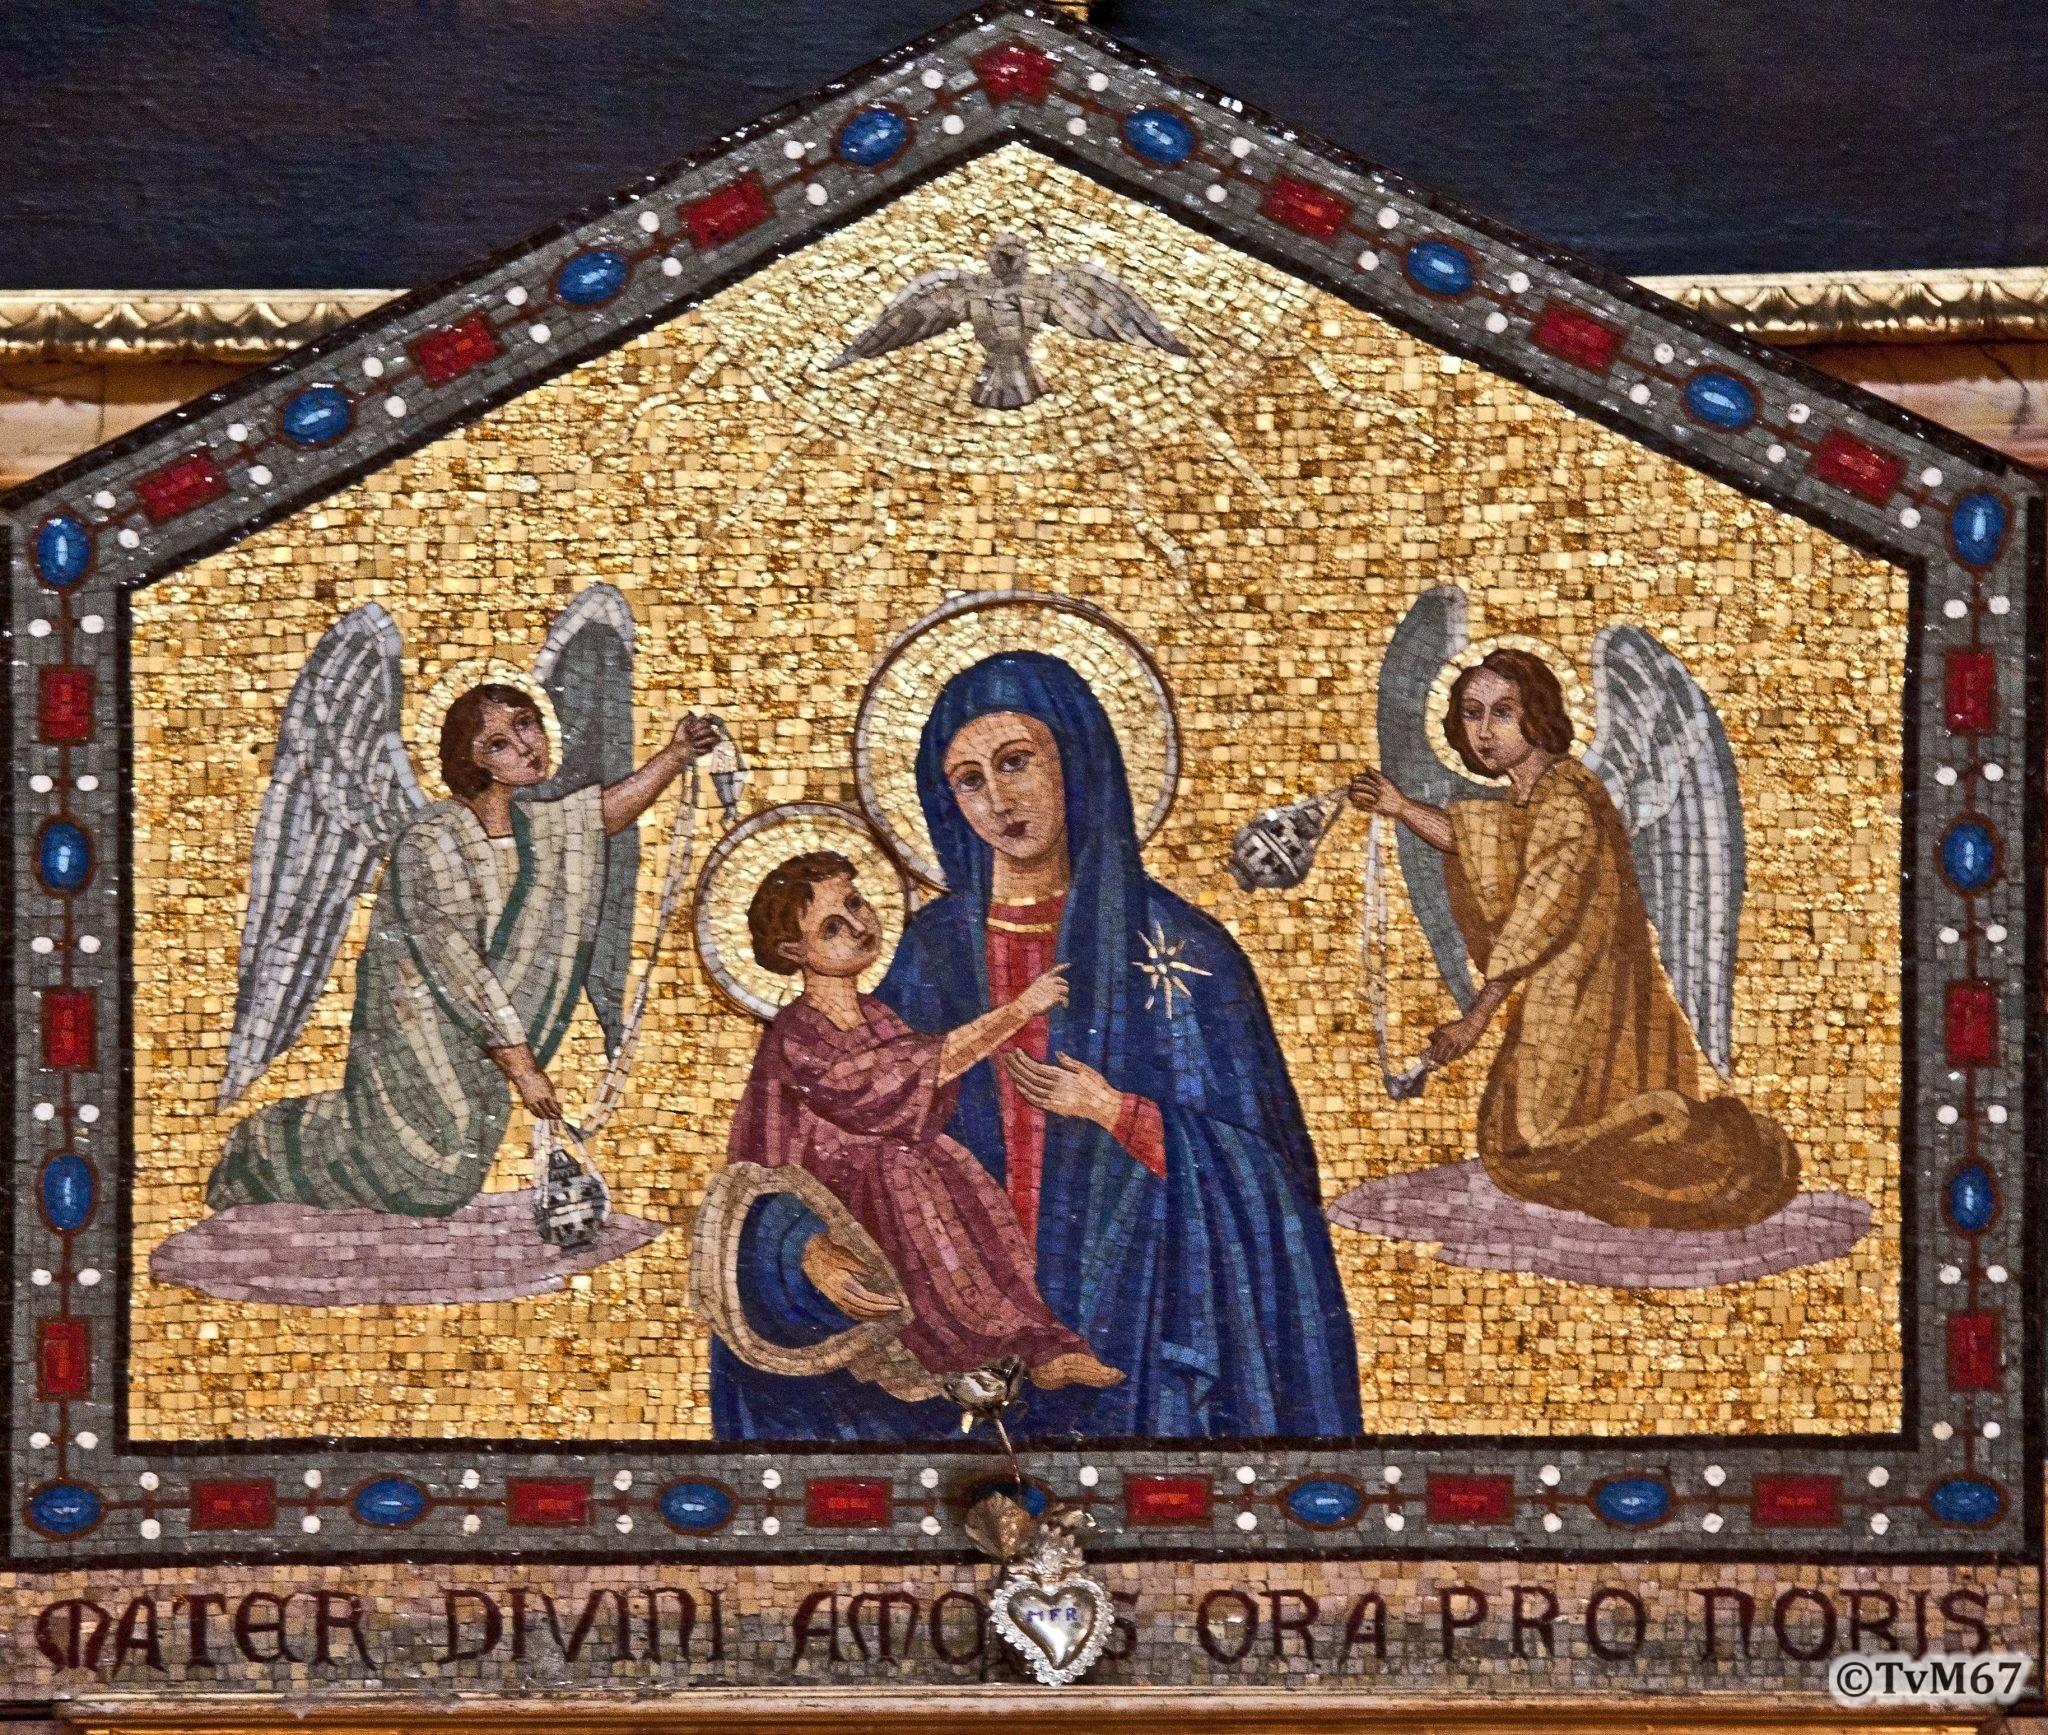 Roma, Chiesa di Sant'Ignazio, 2e k re, Cap Sacripanti, Altaar, mozaïek